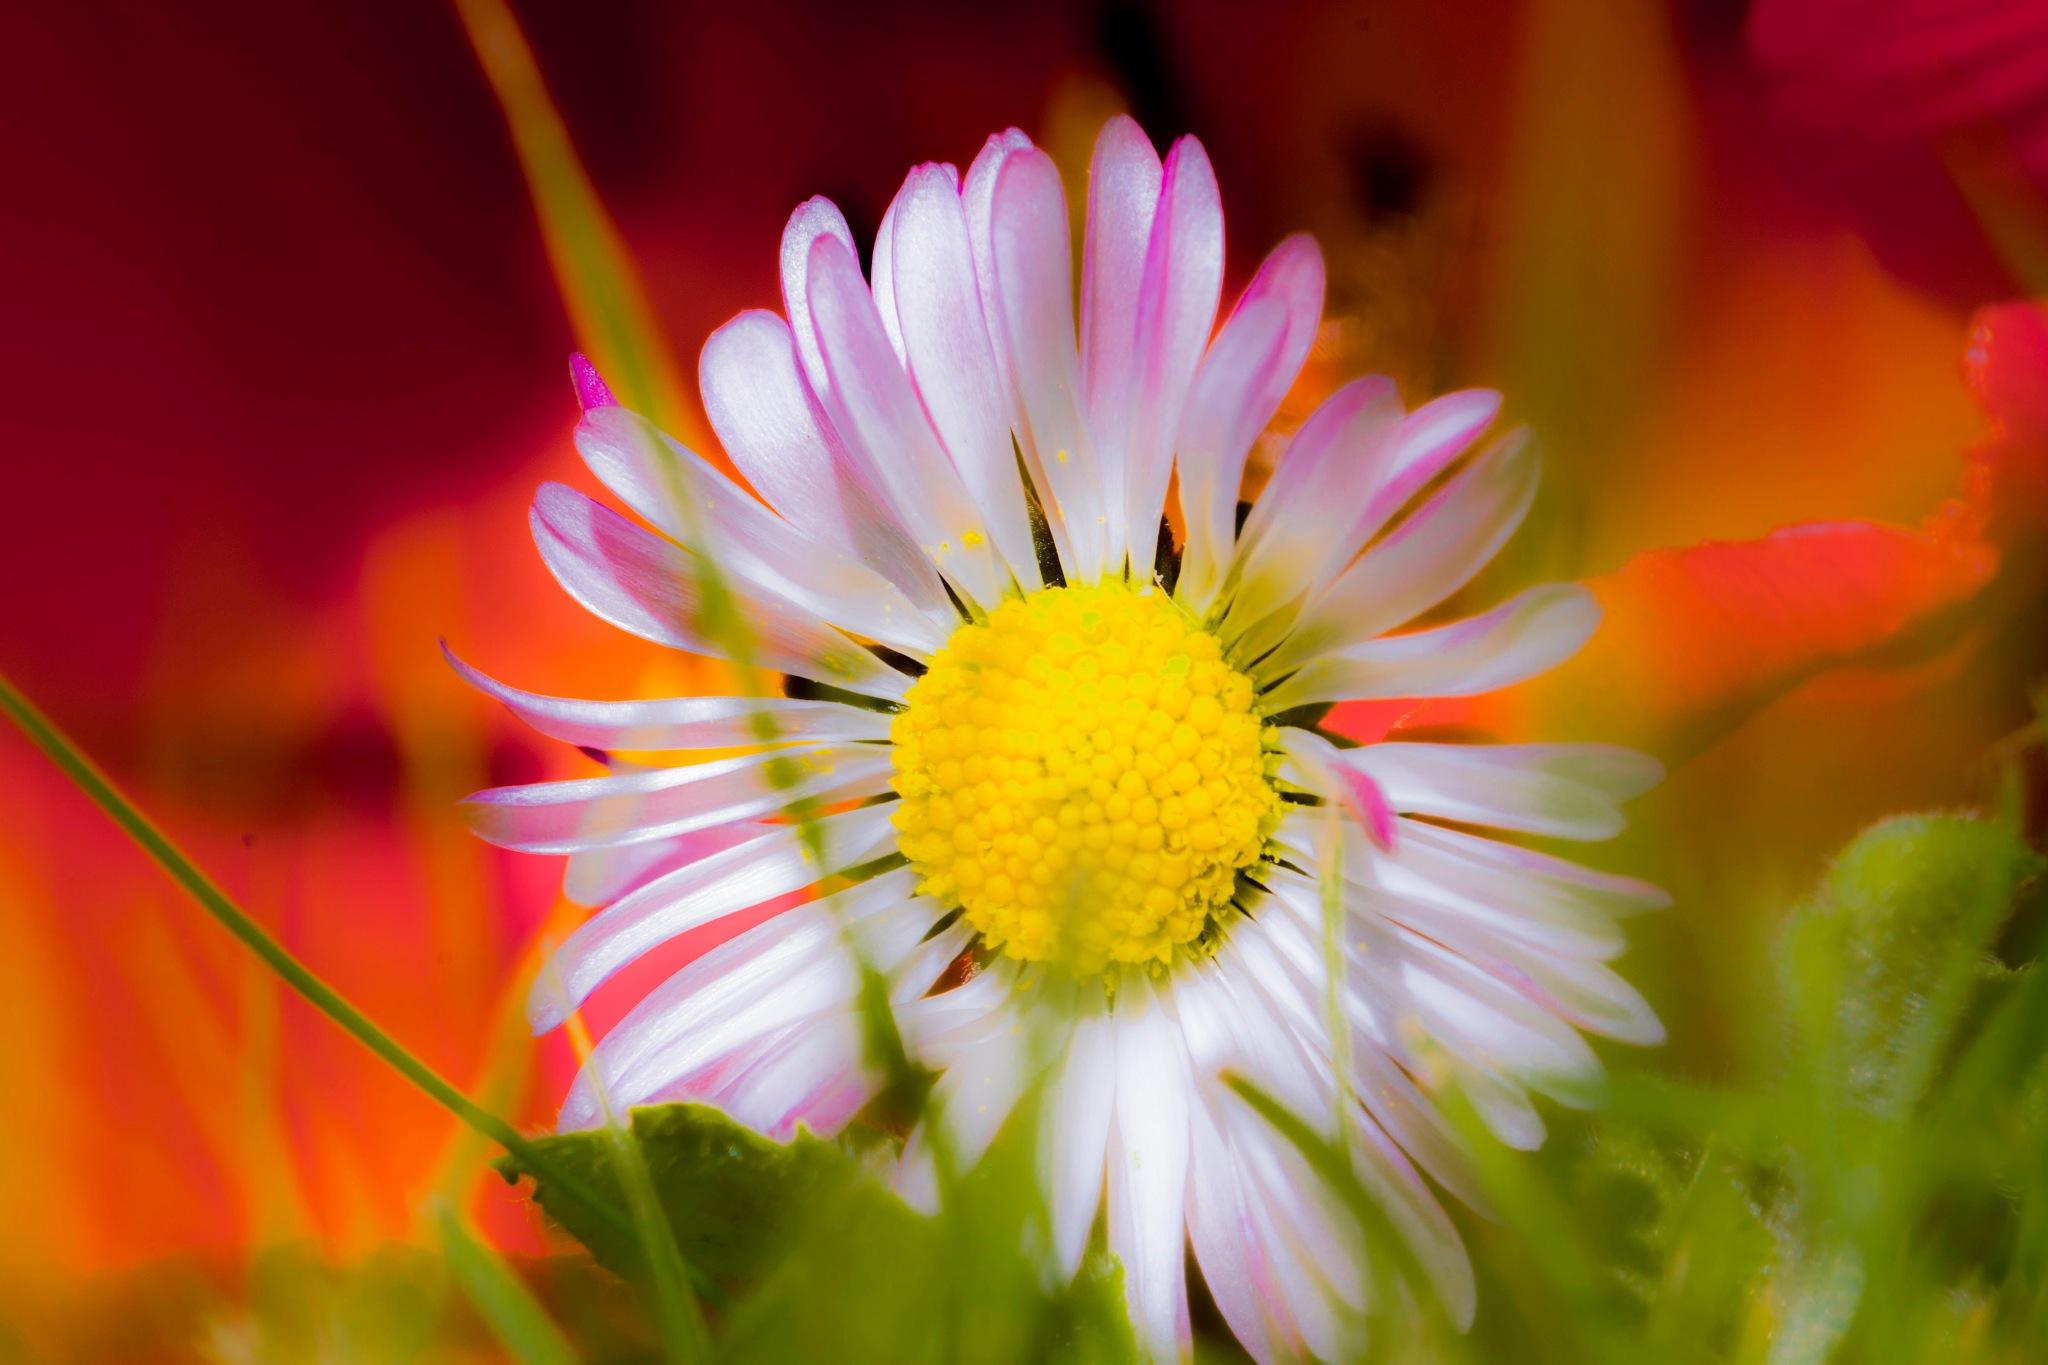 spring Daisy by myra.watson3